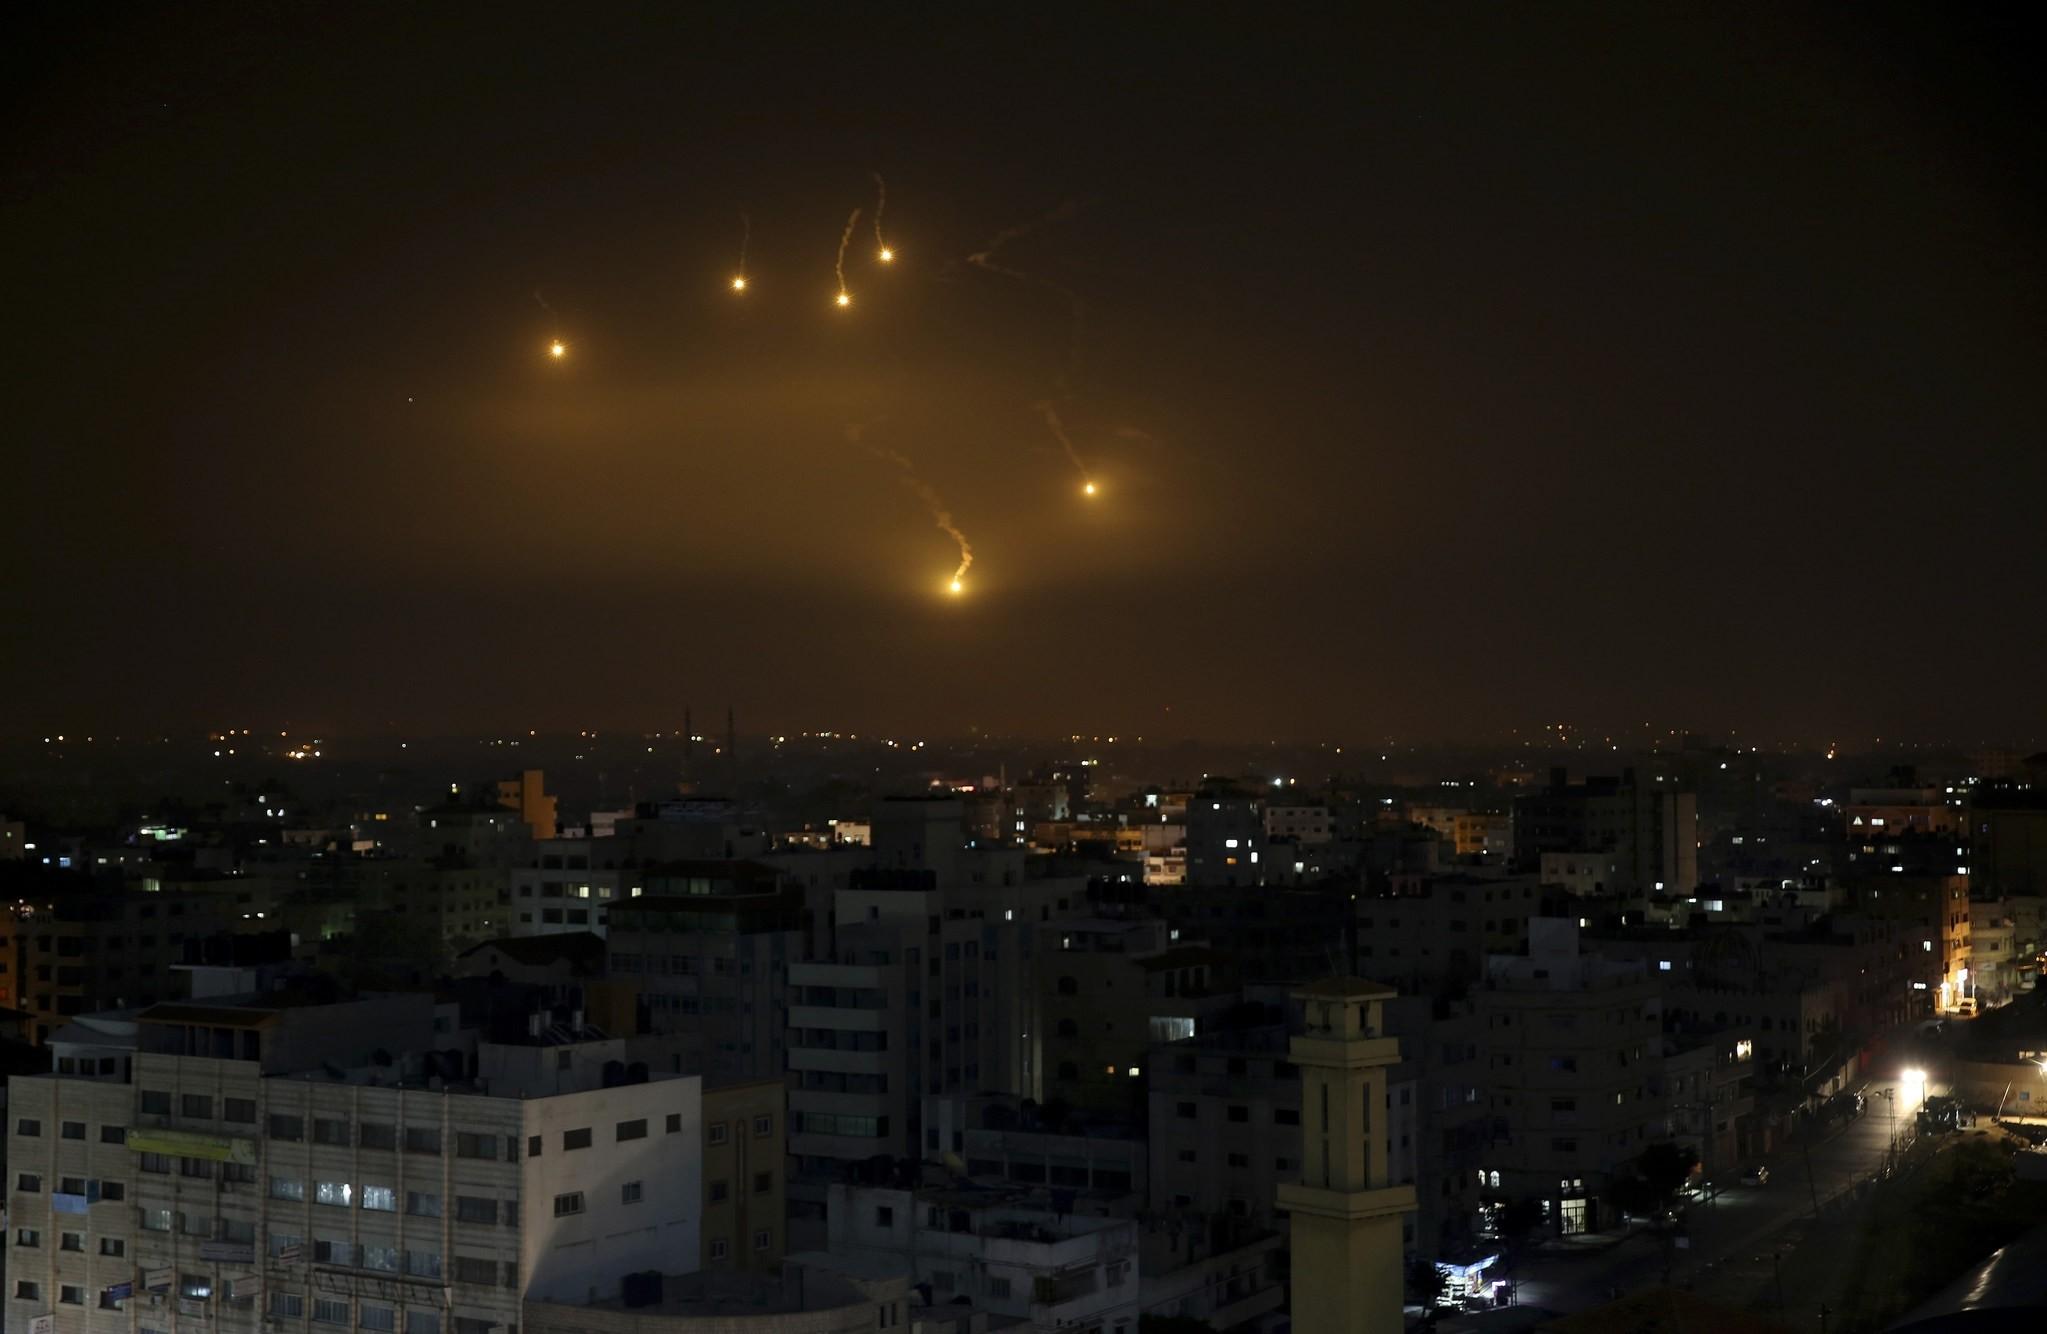 Israeli forces' flares light up the night sky of Gaza City, Monday, Feb. 6, 2017. (AP Photo)